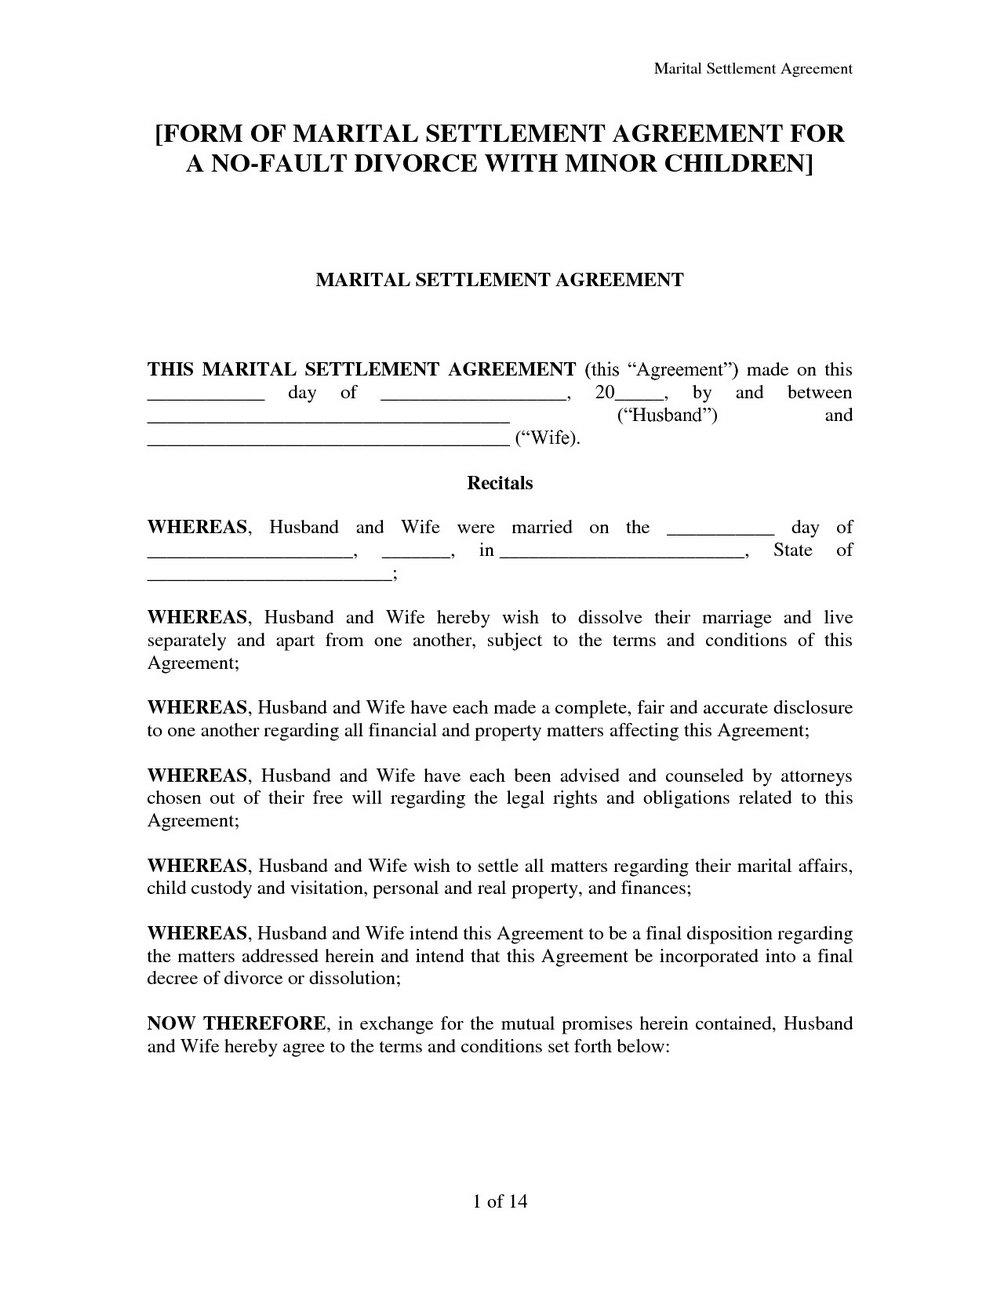 Marital Separation Agreement Form Virginia Forms Otu0nq